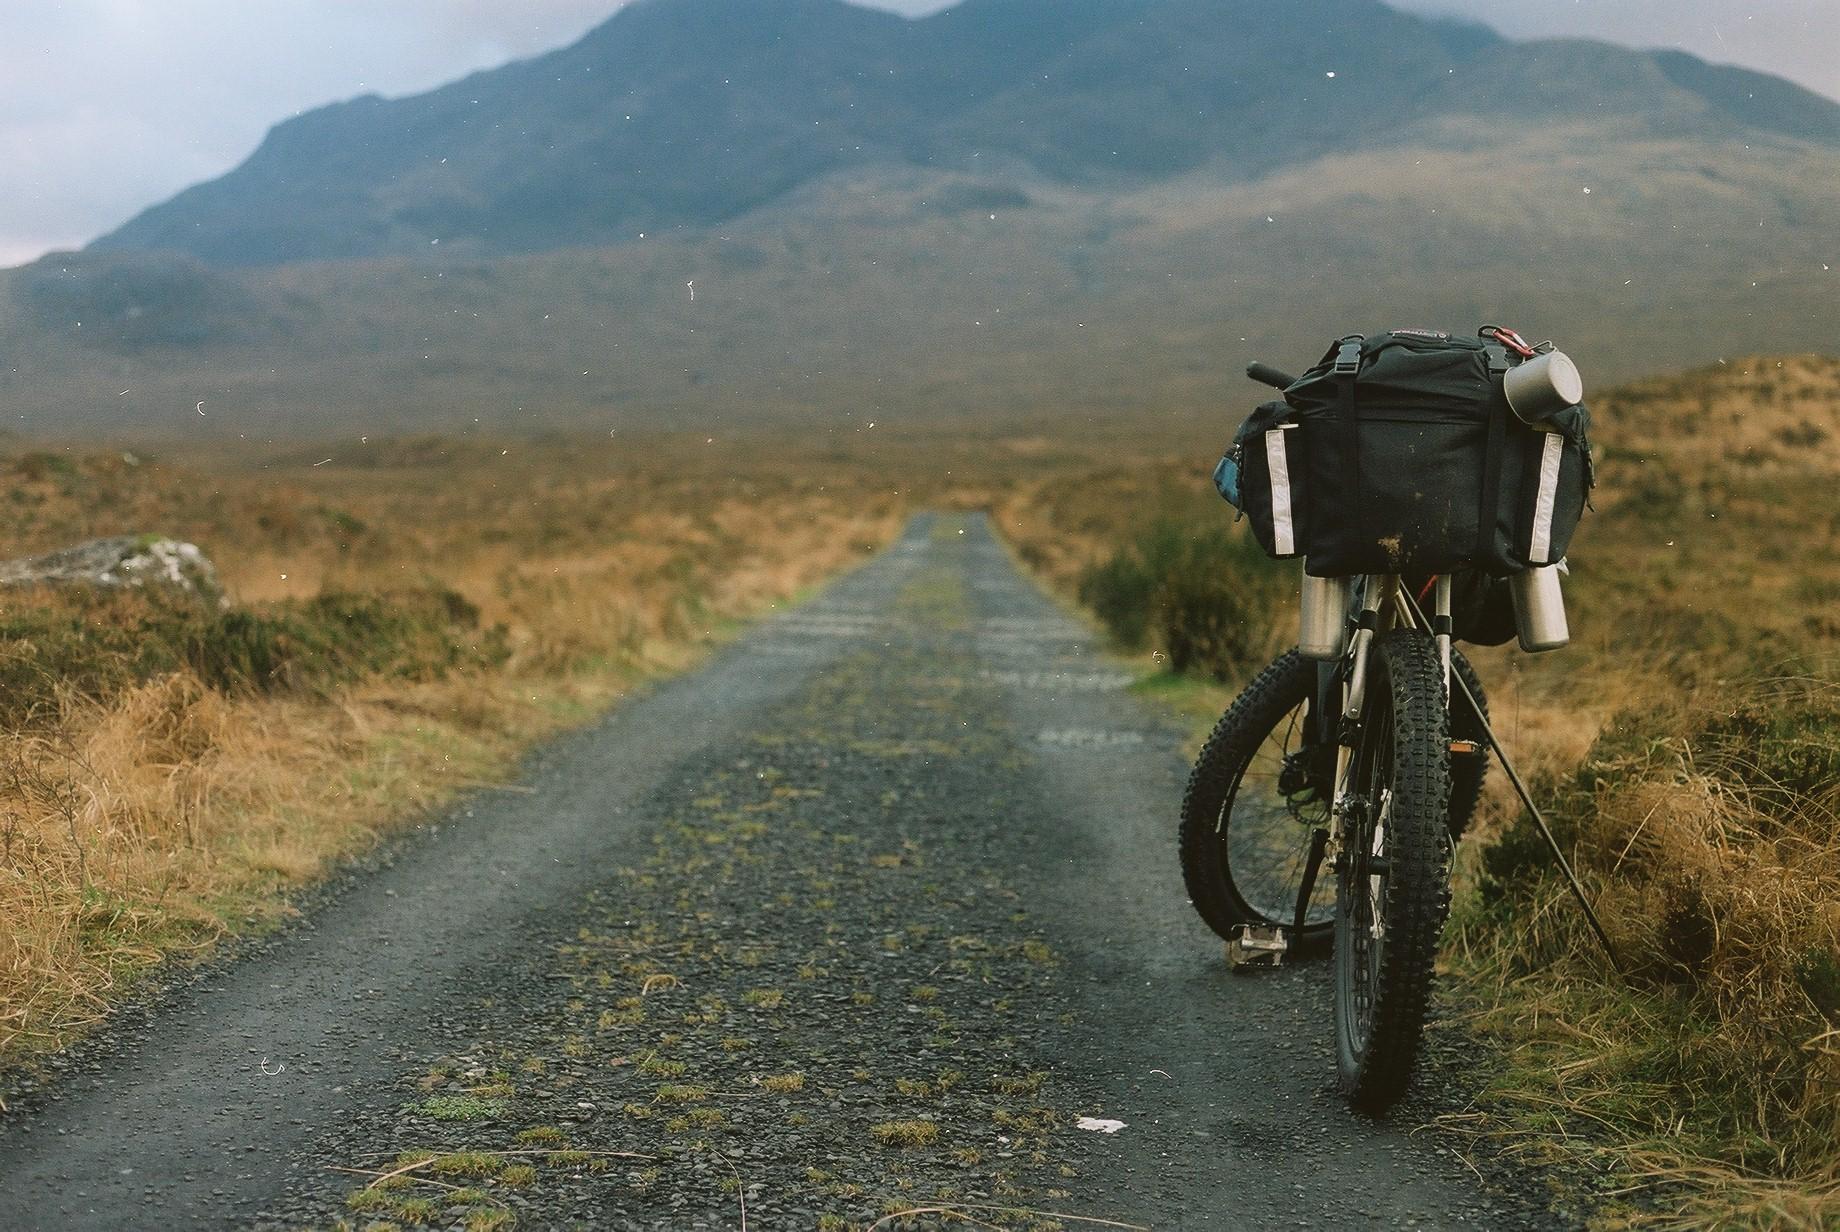 film is not dead, canon, canon ae1, ae1, kodak, kodak film, kodak portra, portra 160, analog photography, film photography, jack macgowan, bikepacking, bikepacking blog, cycling blog, travel photography, travel blog, skye, isle of skye, scottish highlands, bikepacking scotland, bicycle touring apocalypse, surly, surly bikes, surly instigator, instigator